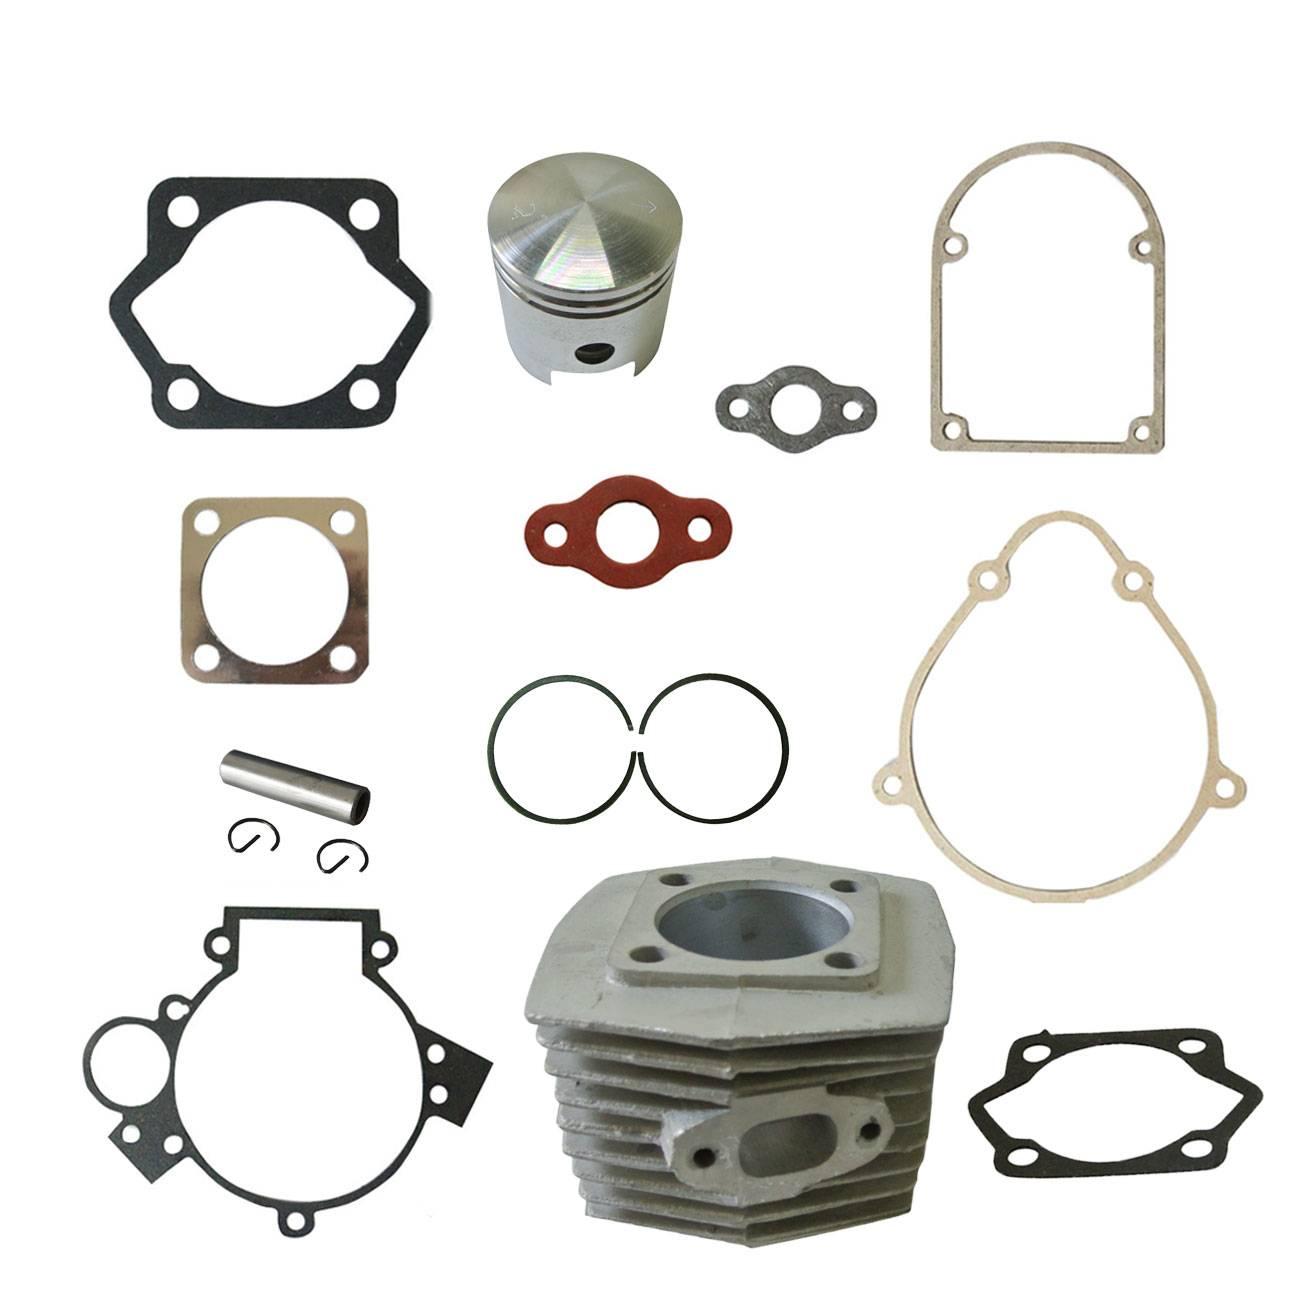 HURI 3set Cylinder Head Bottom Gasket for Motorized Bicycle Bike 49cc 60cc 66cc 80cc 2 Stroke Engine